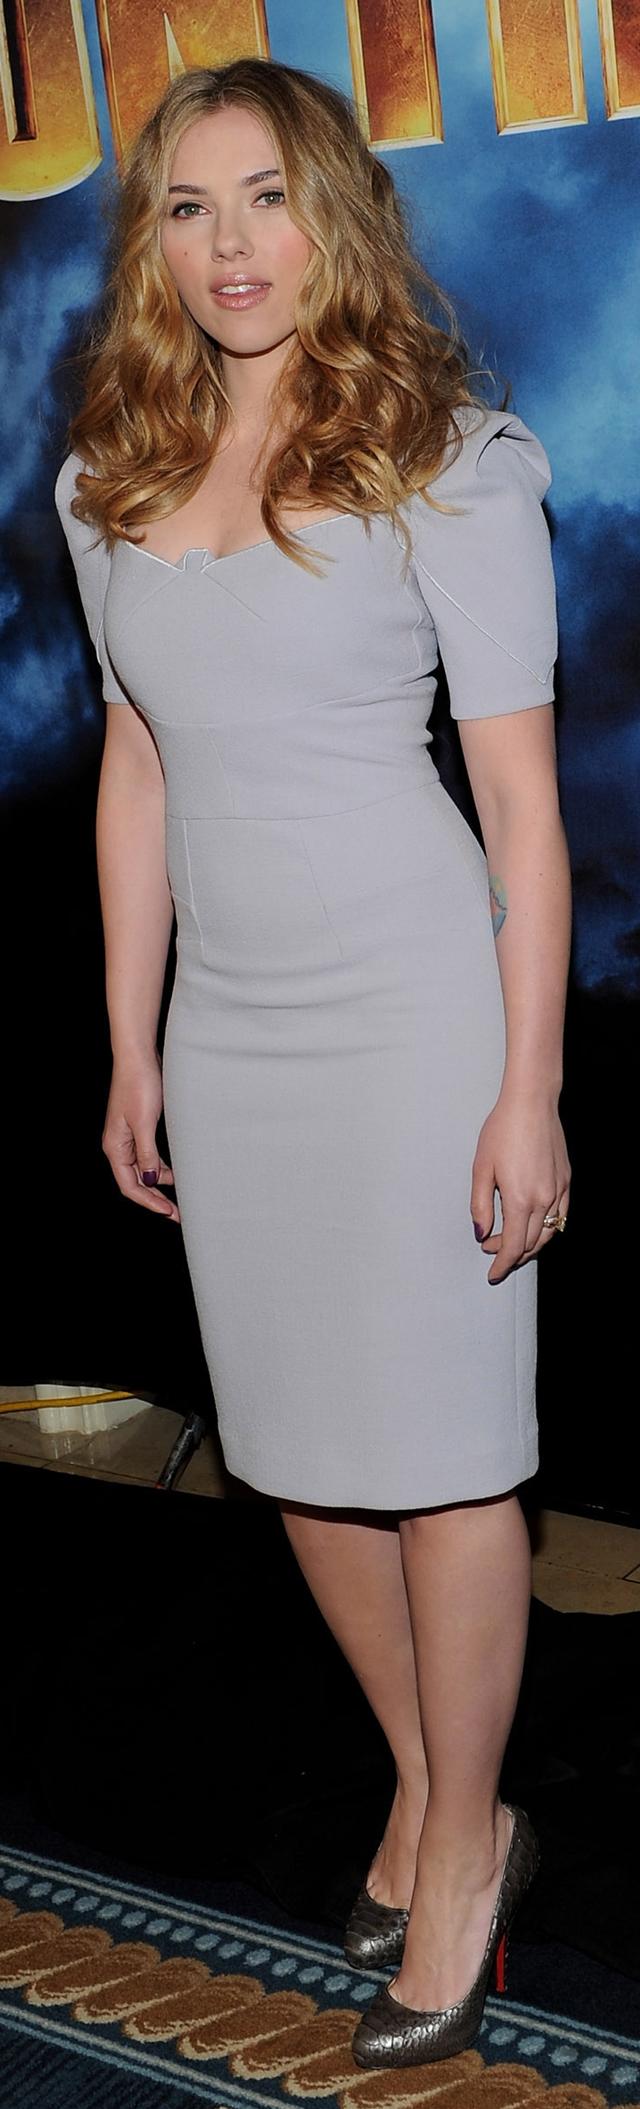 Scarlett Johansson Measurements - Halle Berry Photo -3849